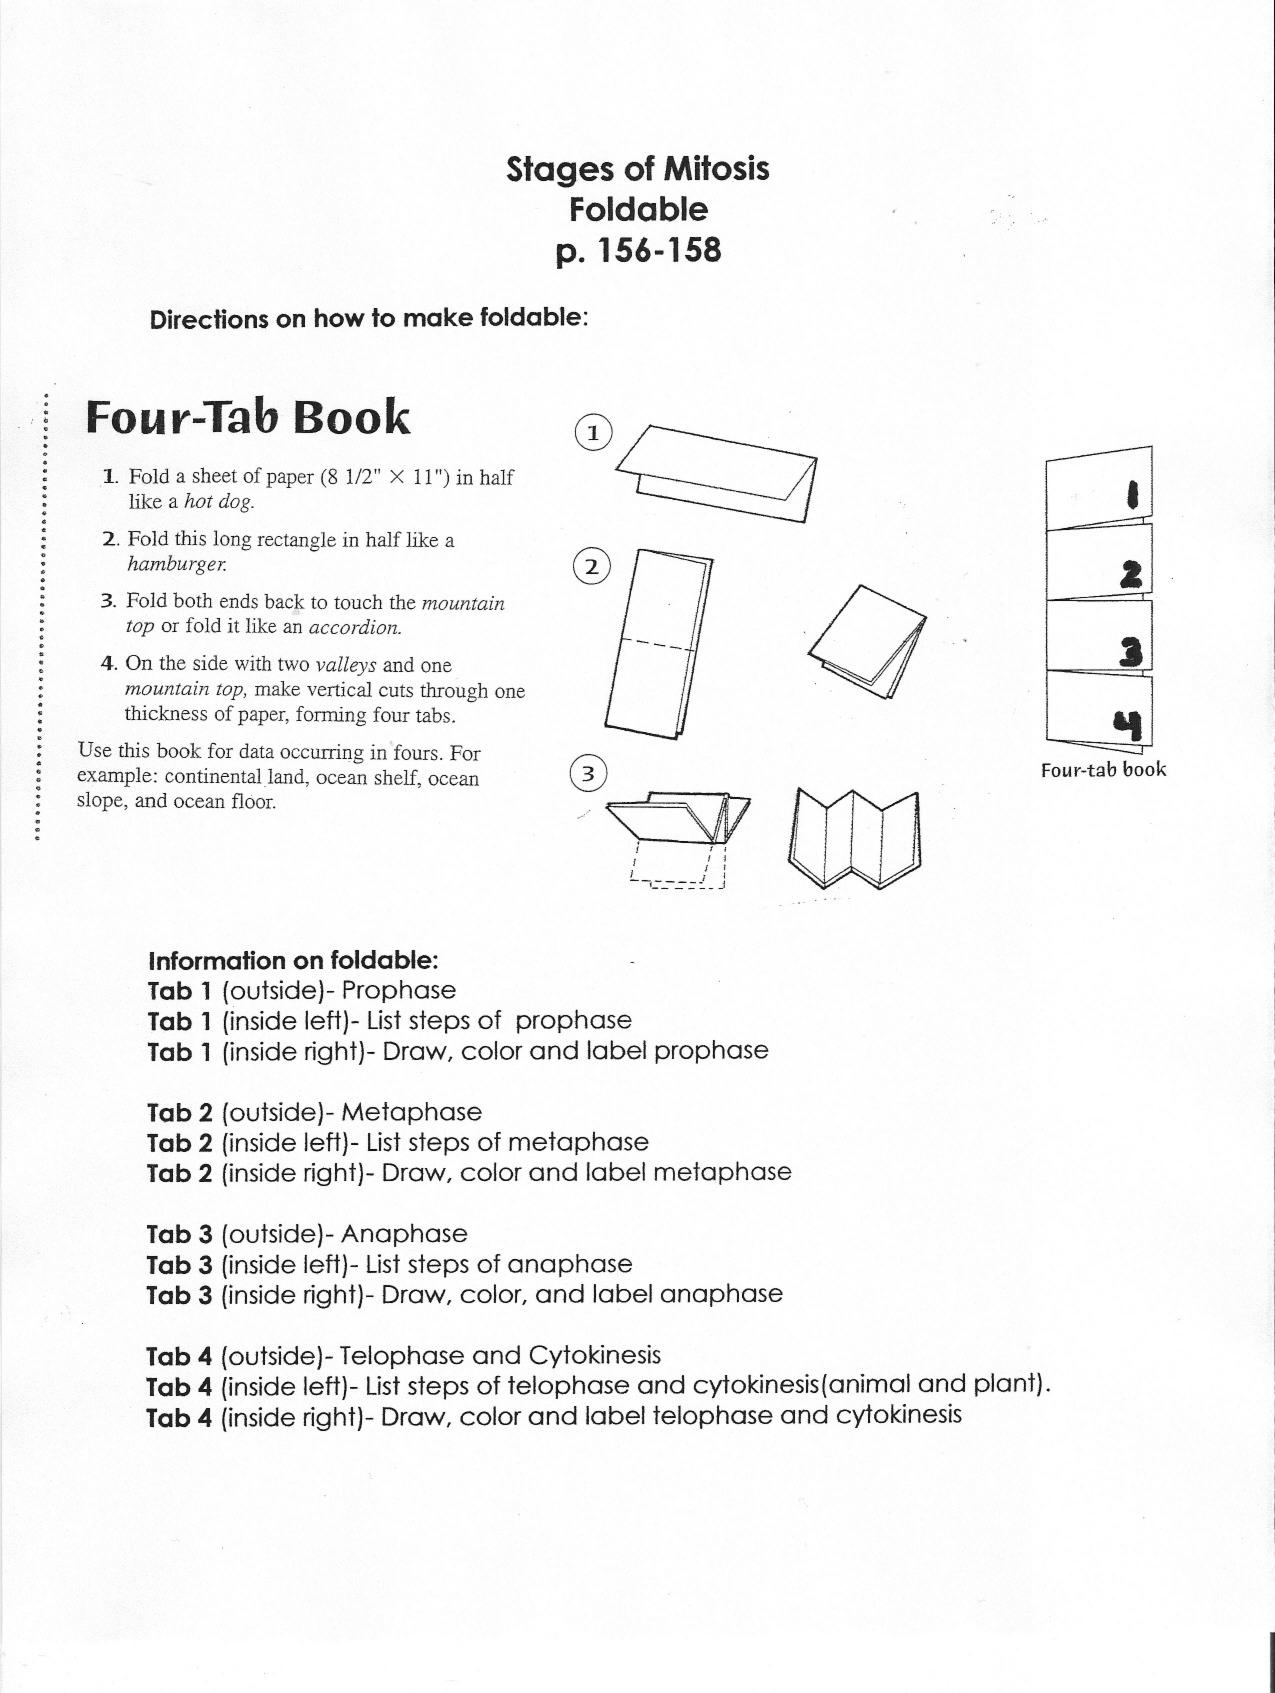 Vocabulary Foldable Template – Meiosis Vocabulary Worksheet